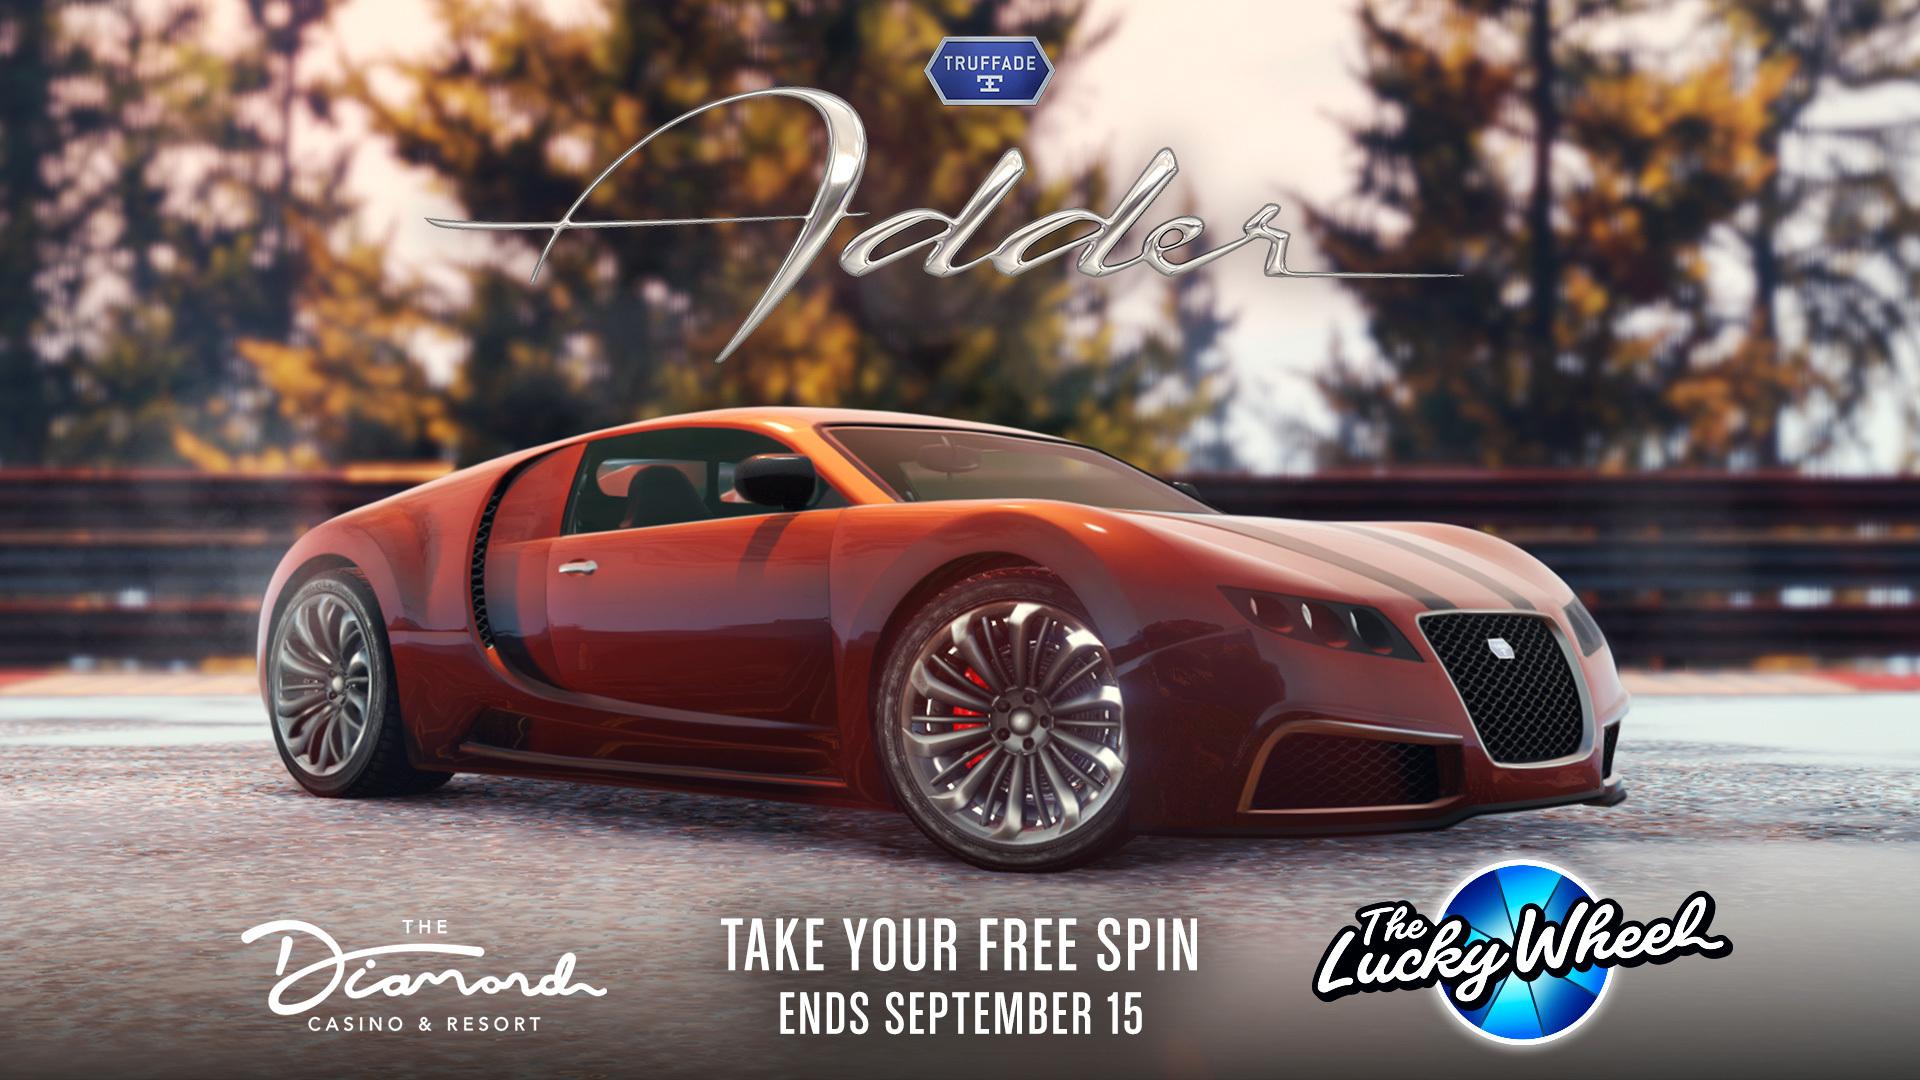 GTA Online Podium Lucky Wheel kocsi: Truffade Adder